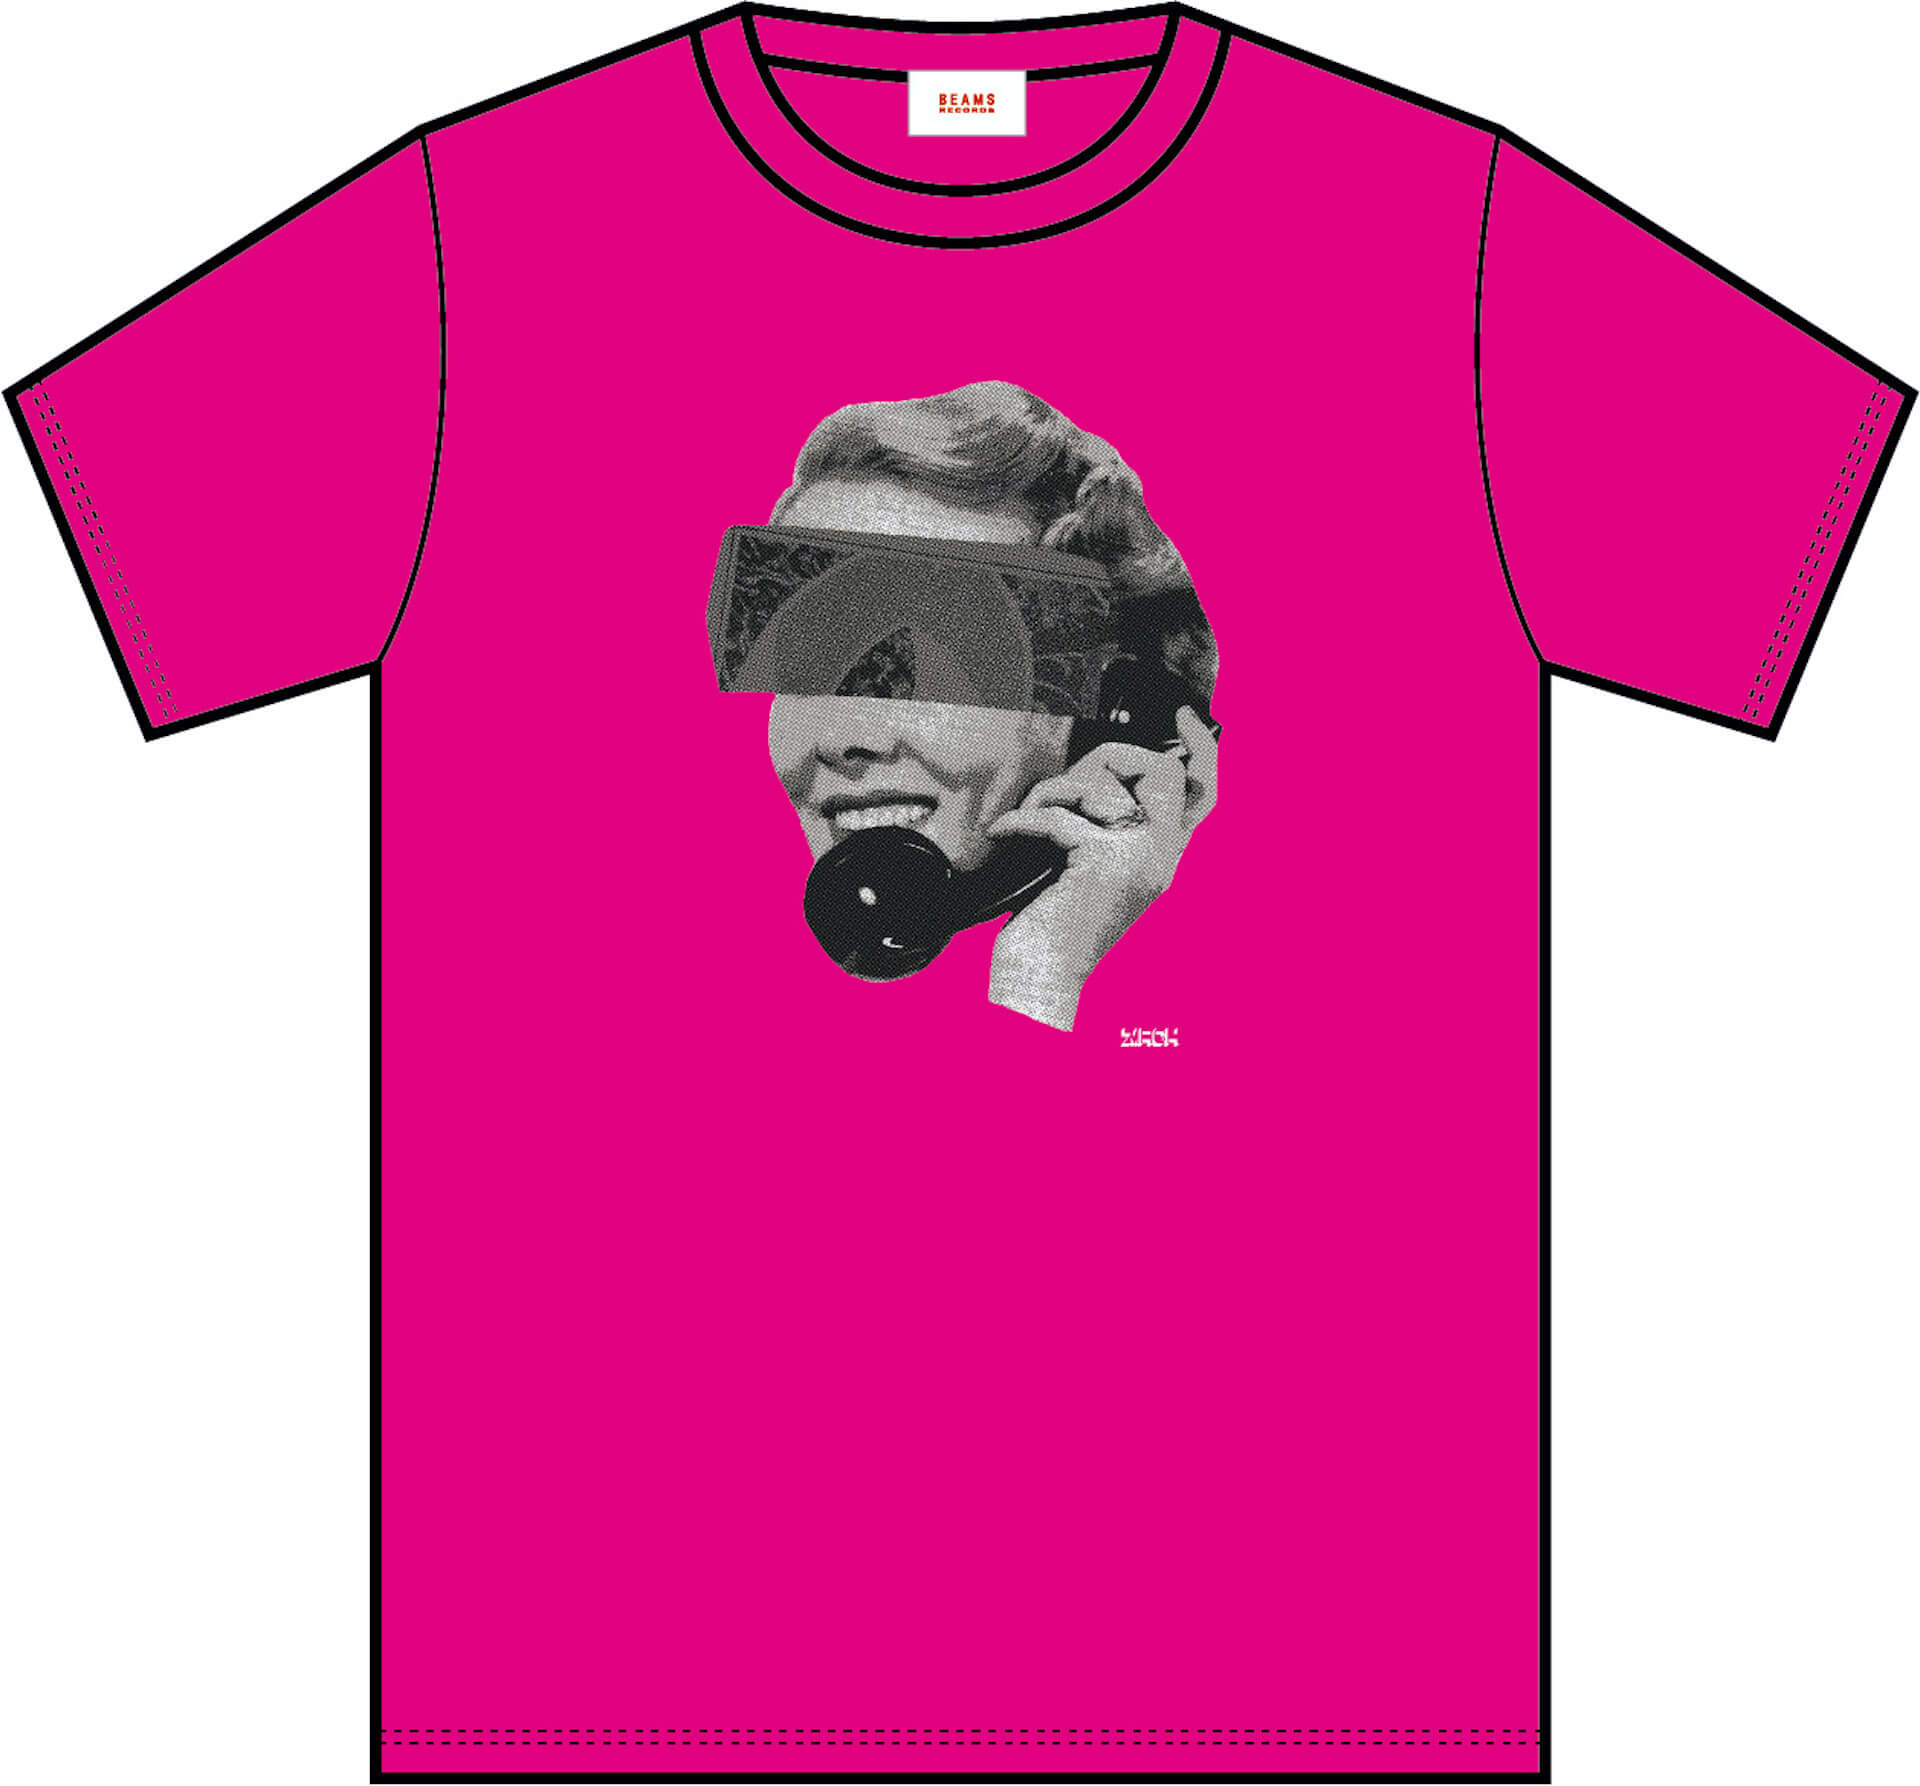 J-WAVE × BEAMS RECORDSのTシャツ第2弾が受注販売開始!本秀康、cherry chill will、TOWA TEIらが参加 music200612_jwave_beamsrecords_03